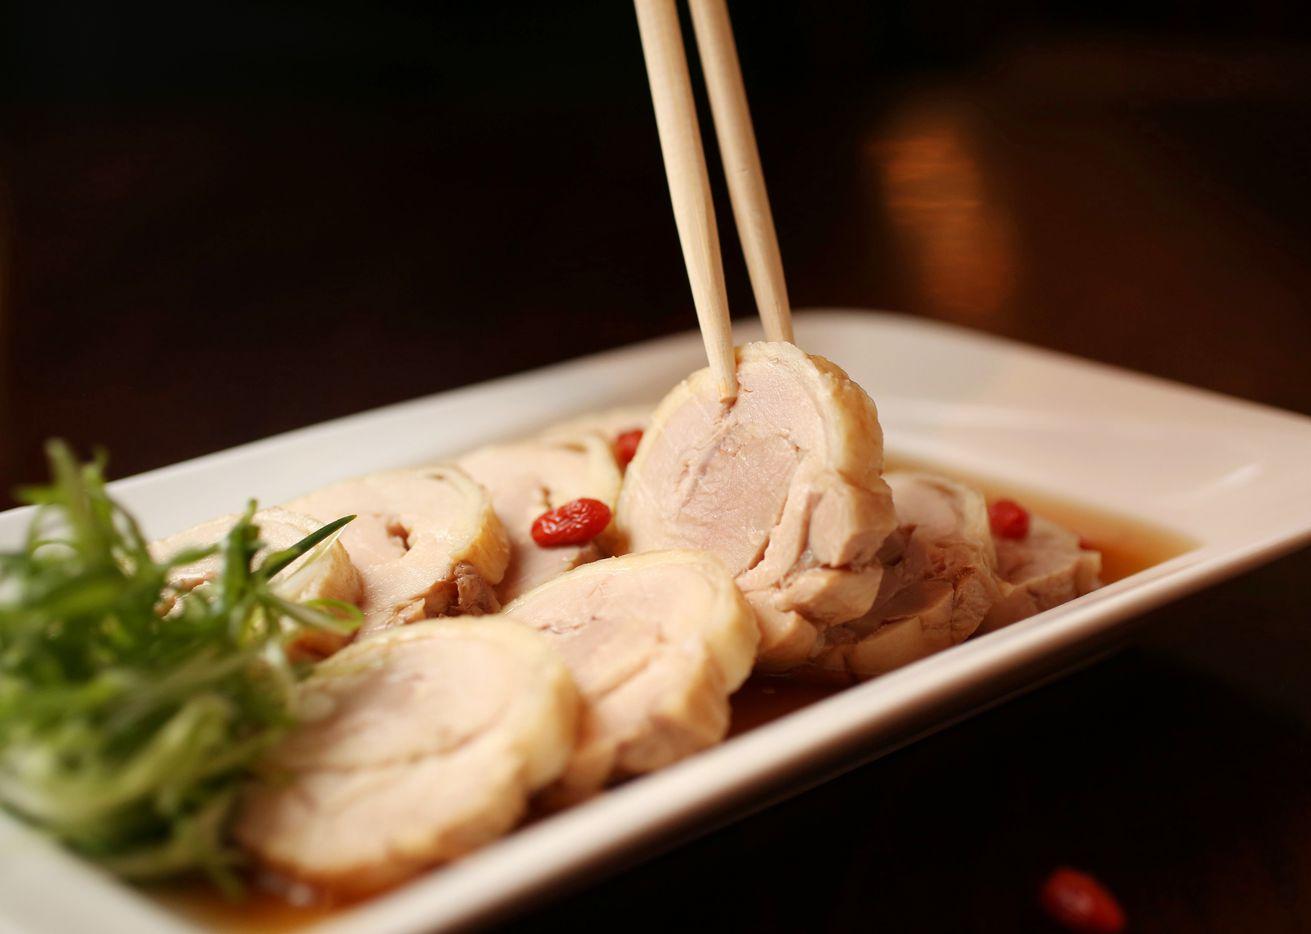 Drunken chicken, an appetizer at Wue Wei Din Chinese Cuisine, a Taiwanese restaurant in Plano (Rose Baca/Staff Photographer)